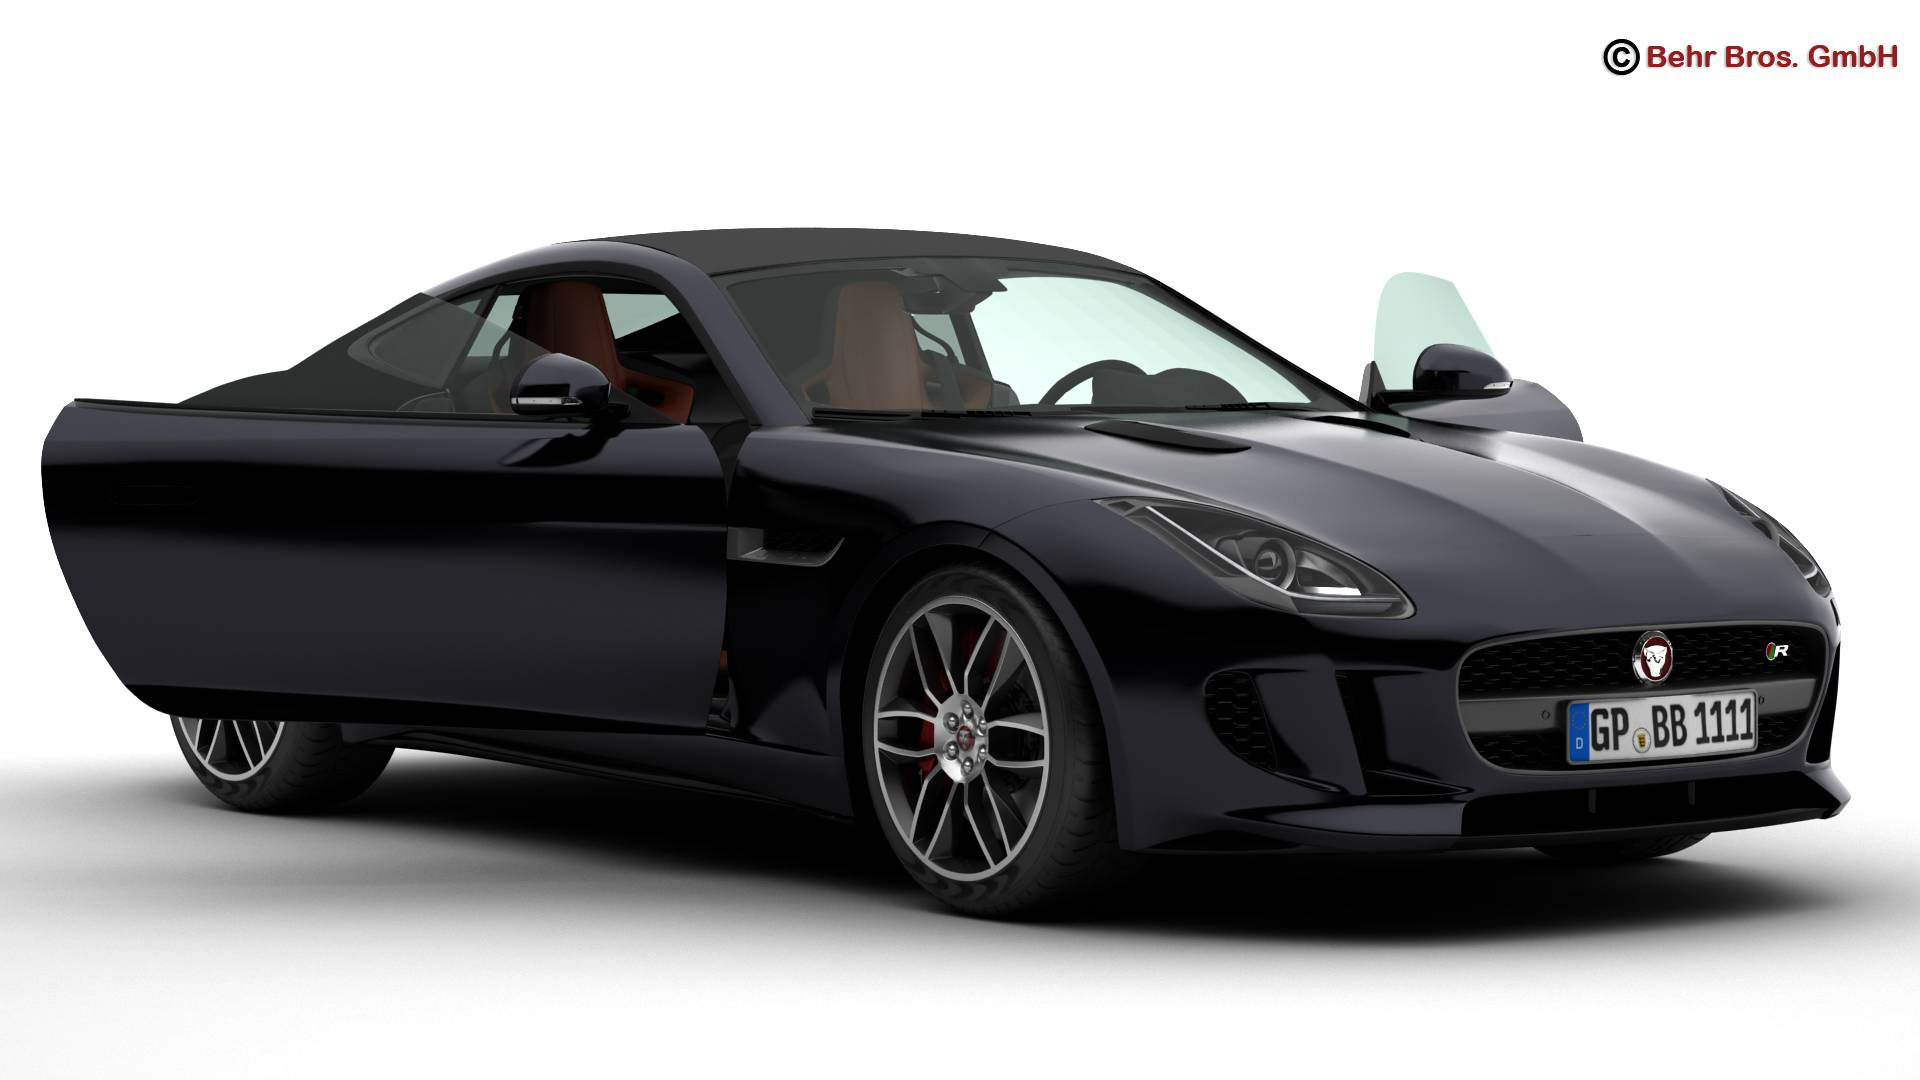 jaguar f type r coupe 2015 3d model buy jaguar f type r coupe 2015 3d model flatpyramid. Black Bedroom Furniture Sets. Home Design Ideas